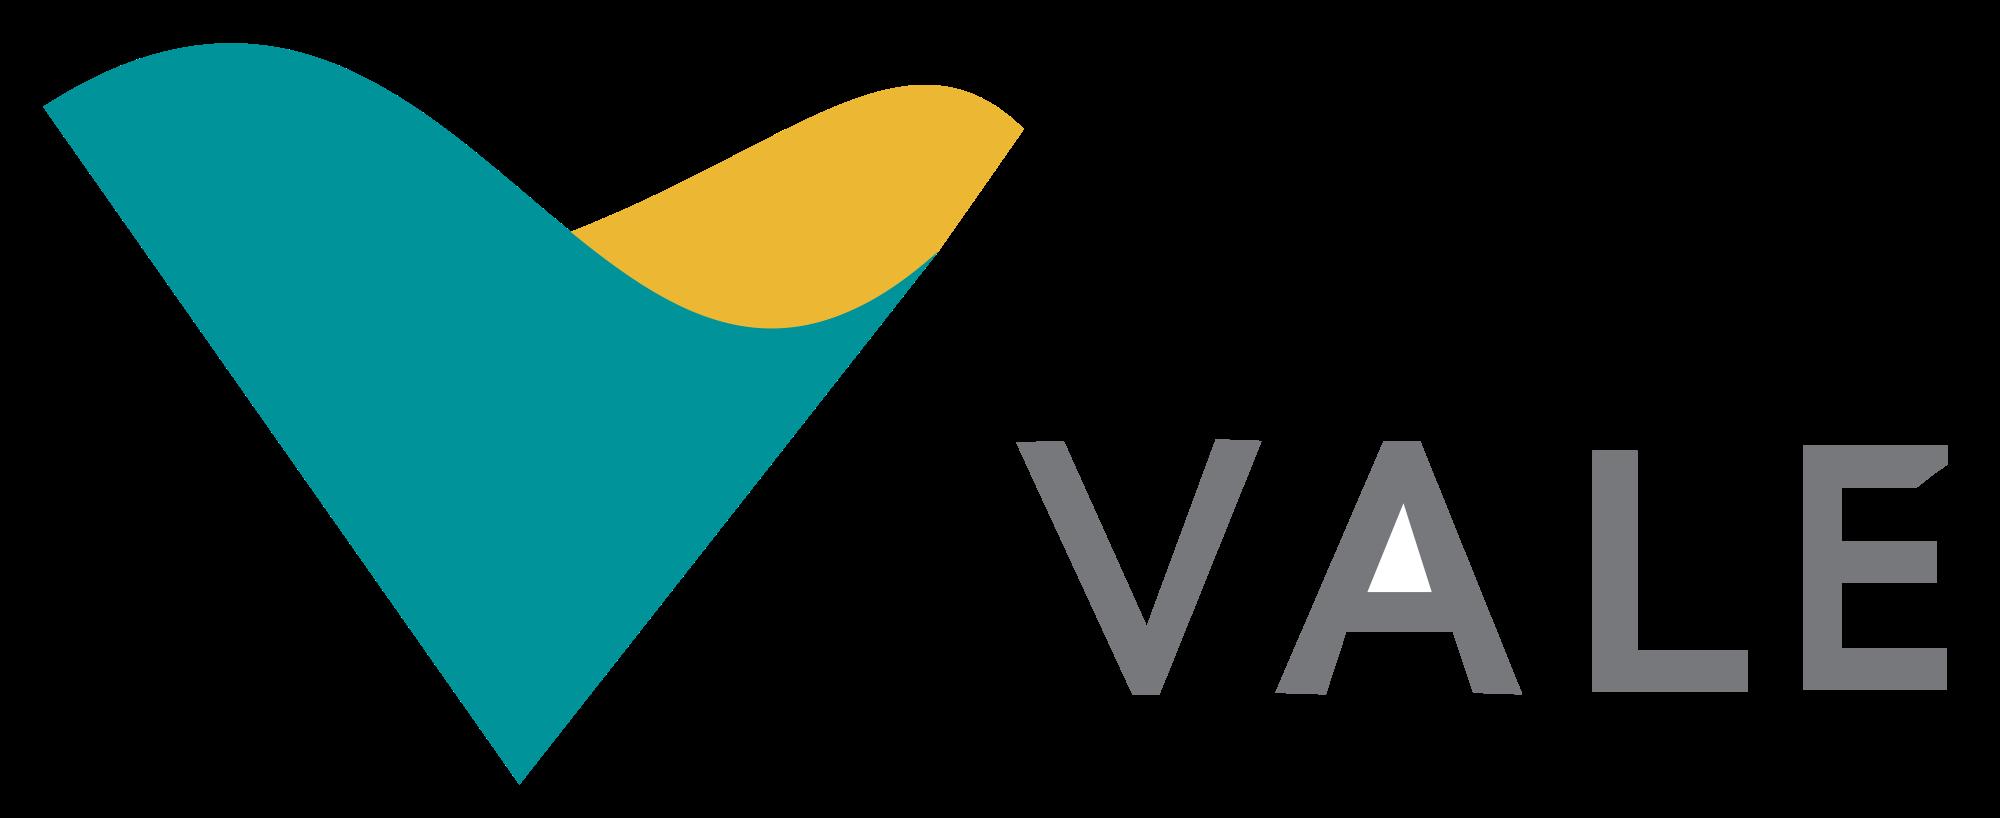 VALE</br>Mining